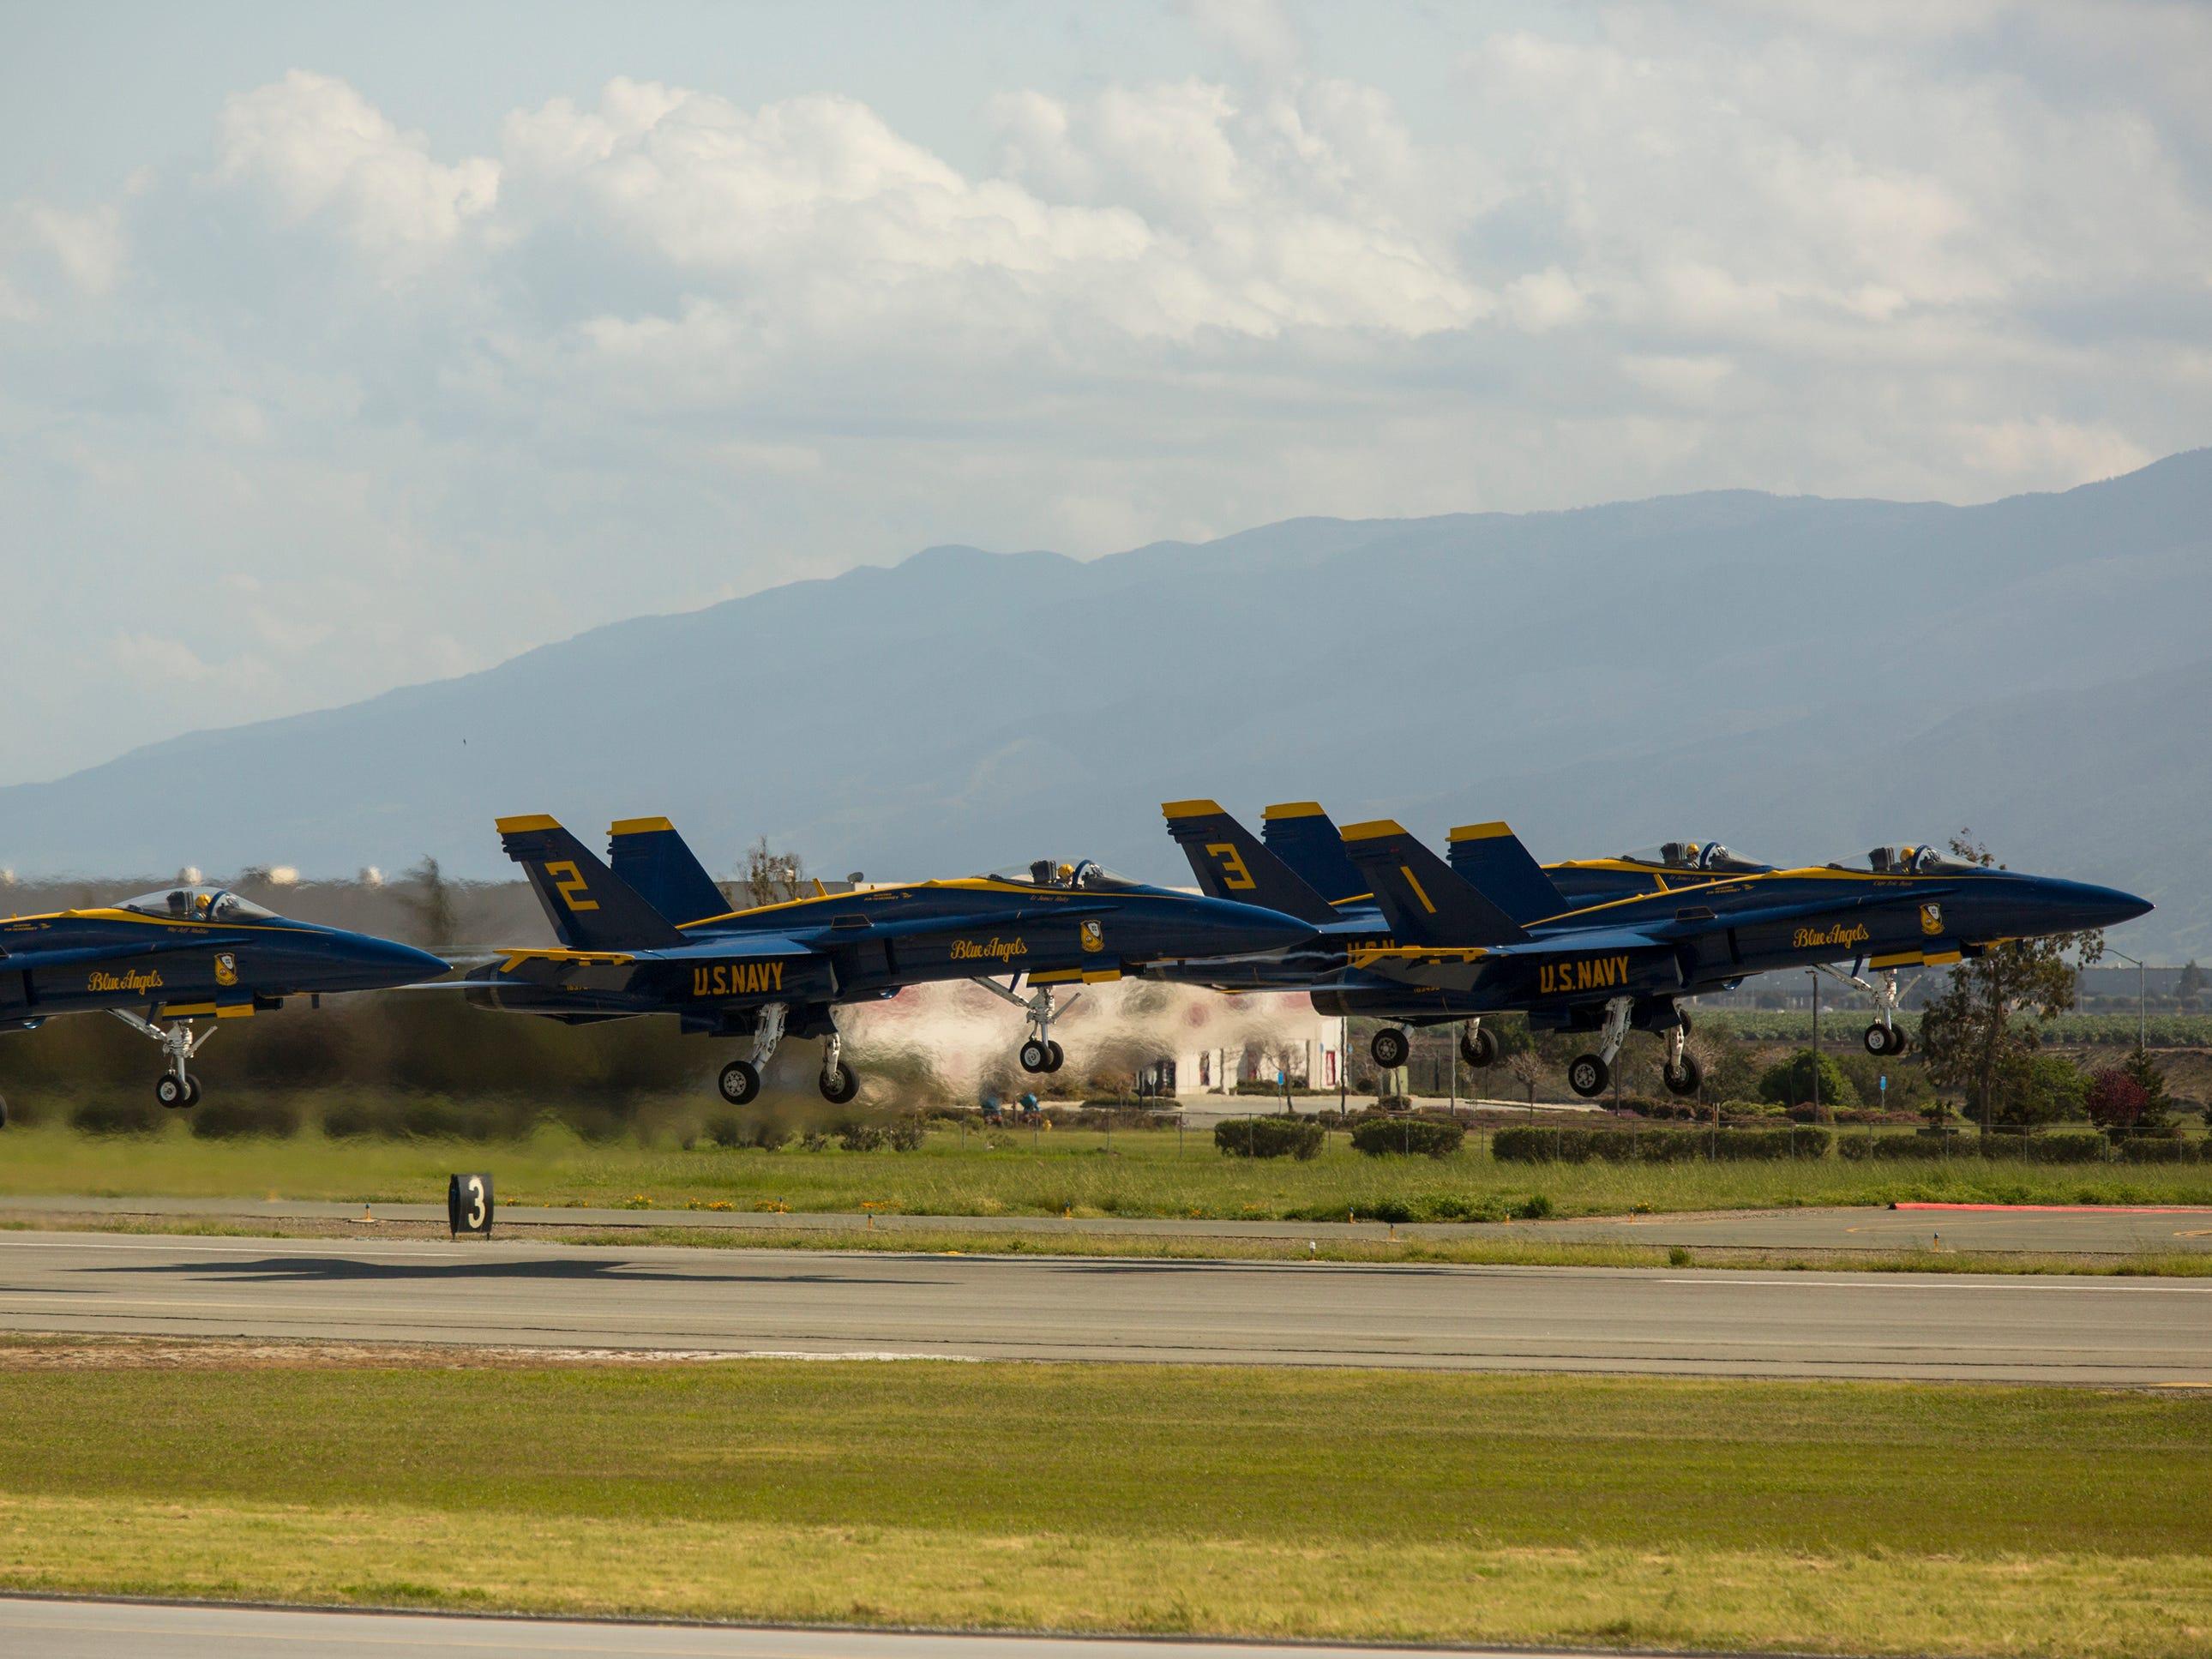 The Blue Angels take flight during the California International Airshow Salinas at the Salinas Airport on March 23, 2019. (Photo by David Royal)